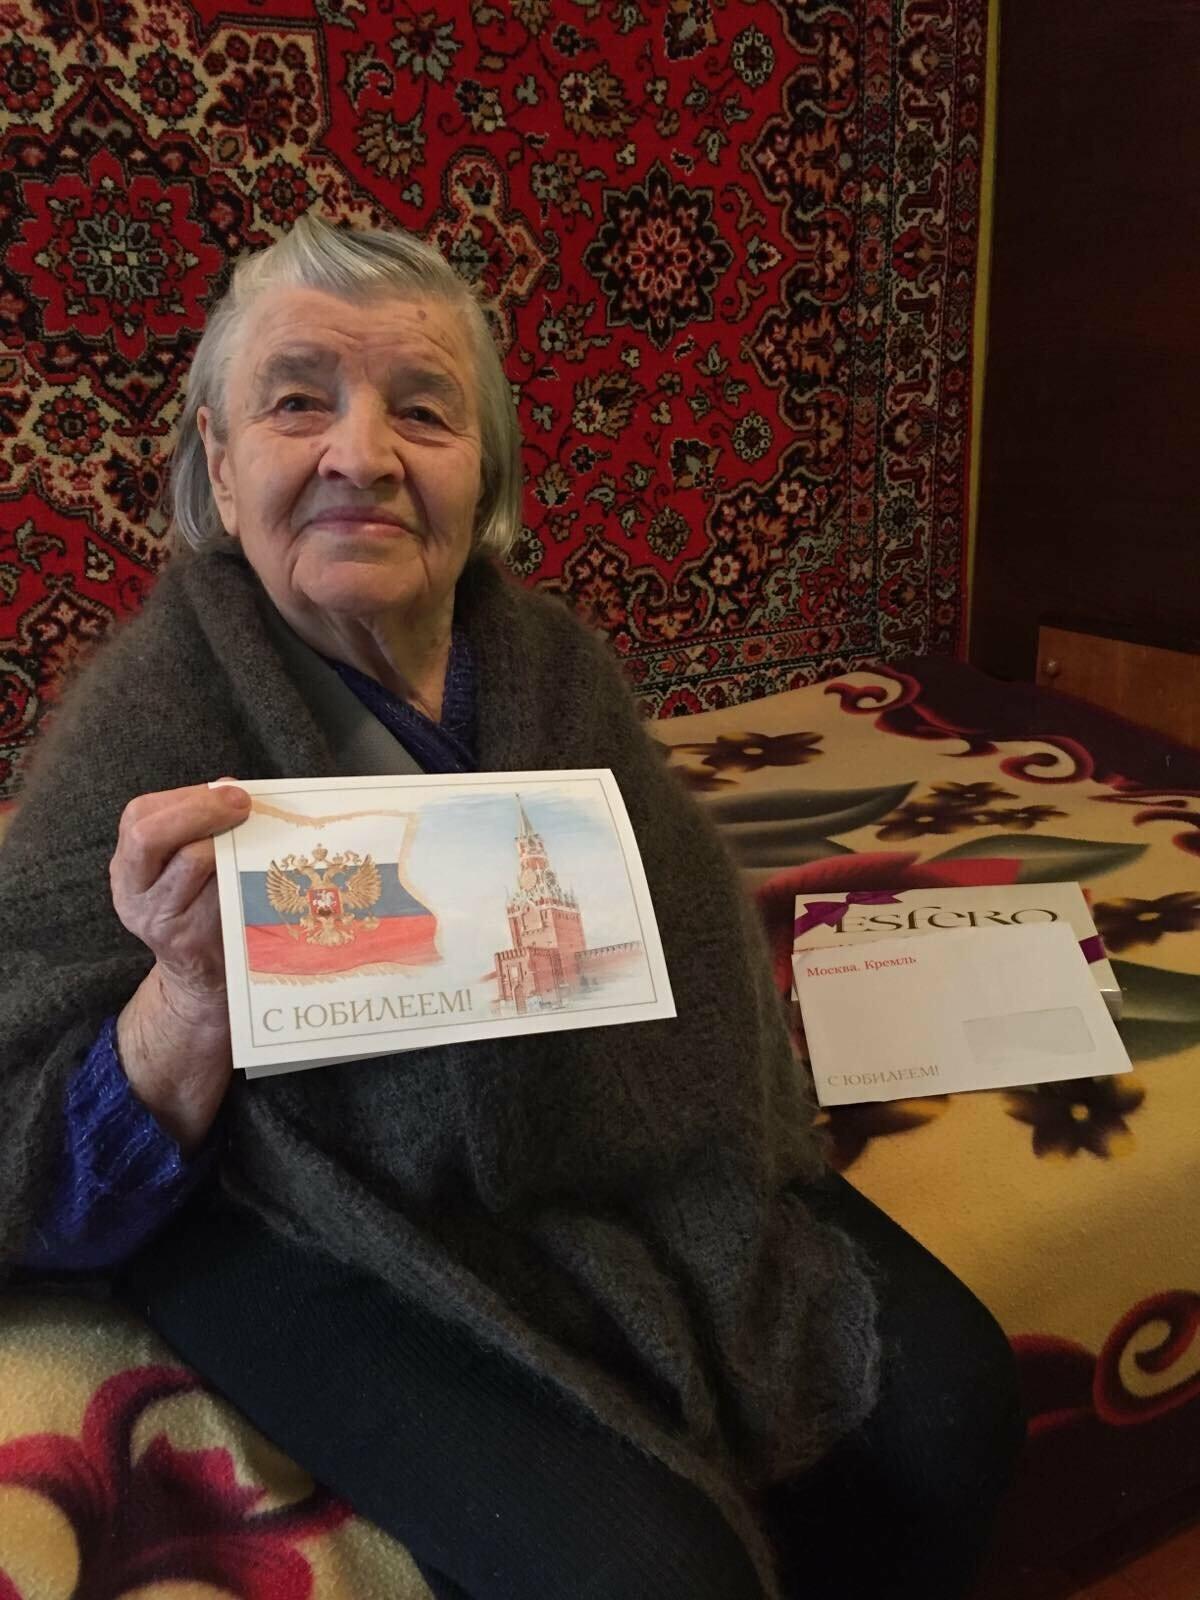 Жителей Ялты поздравили с 90-летними юбилеями, фото-2